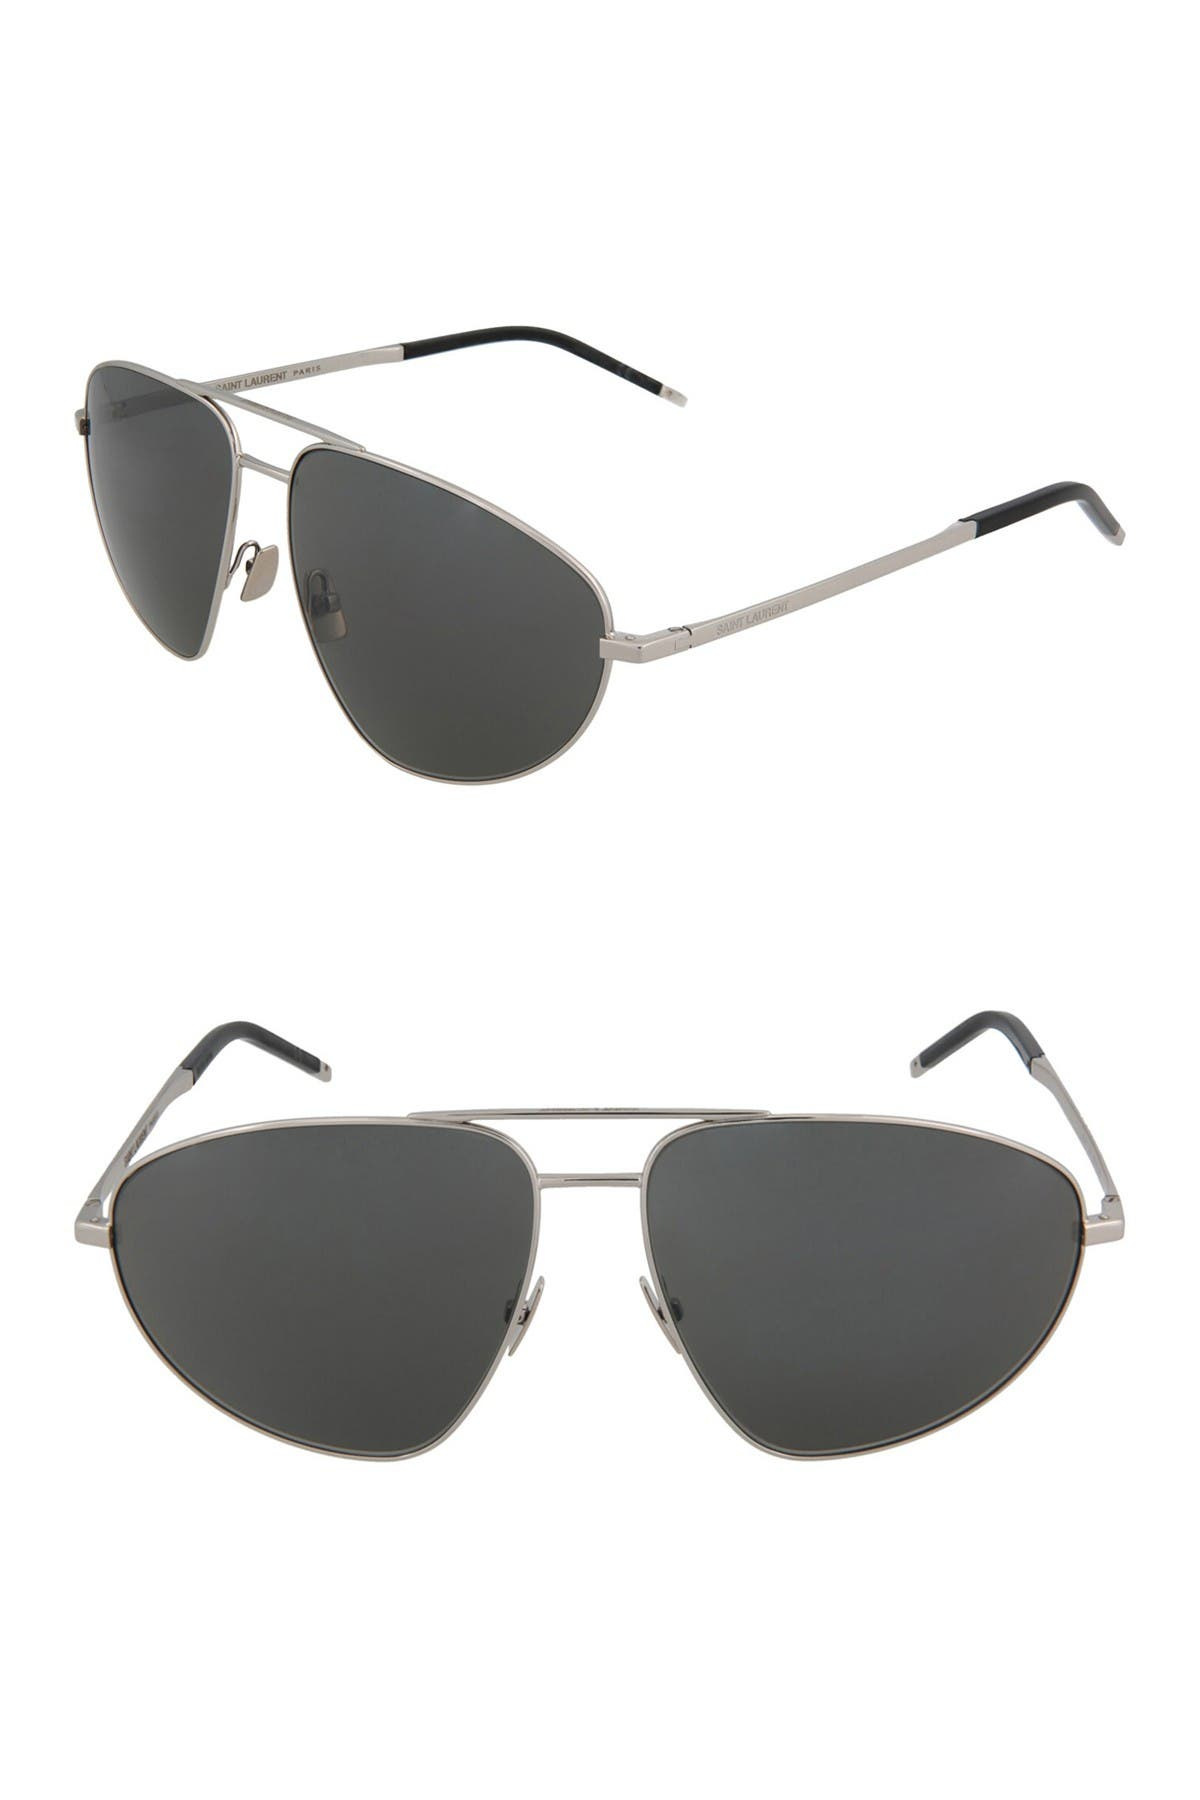 Image of Saint Laurent 60mm Modified Aviator Sunglasses